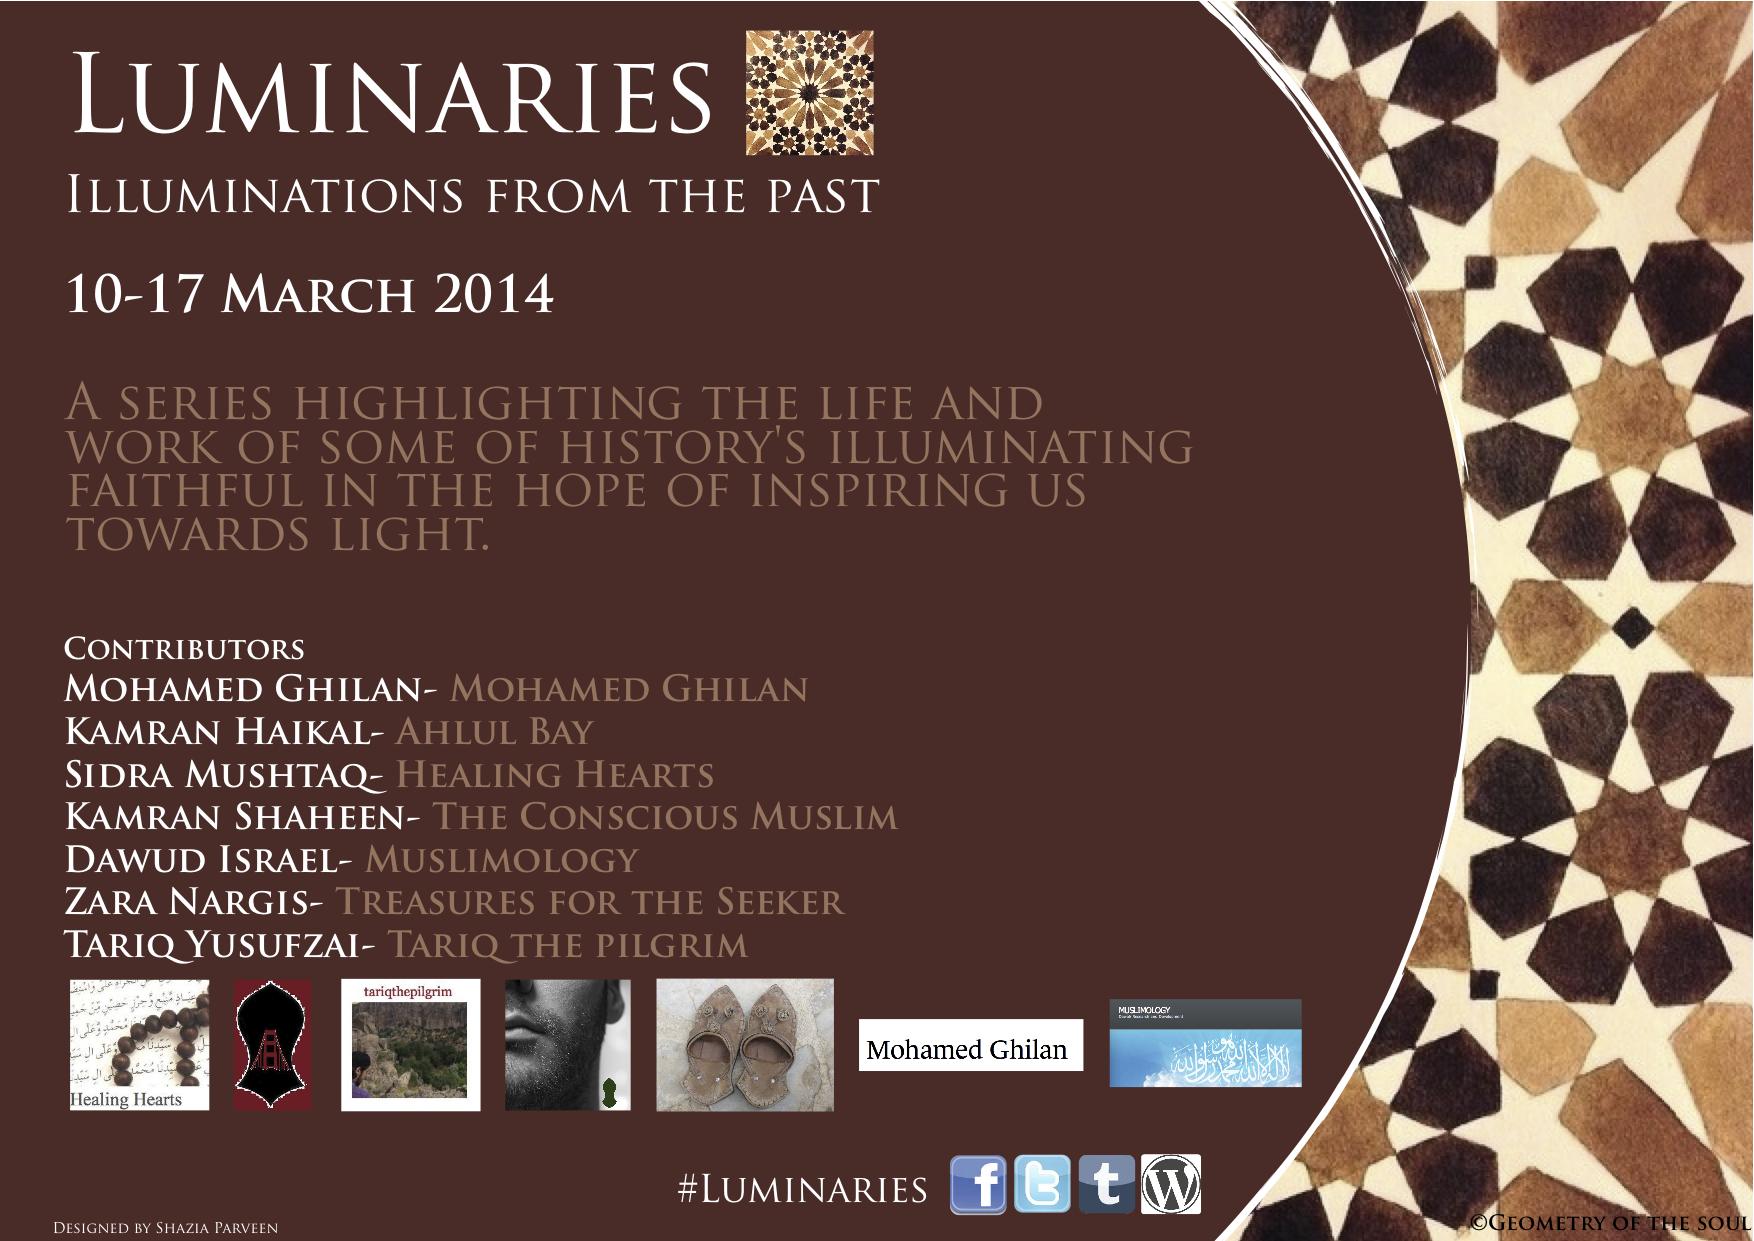 Luminaries flyer PNG image